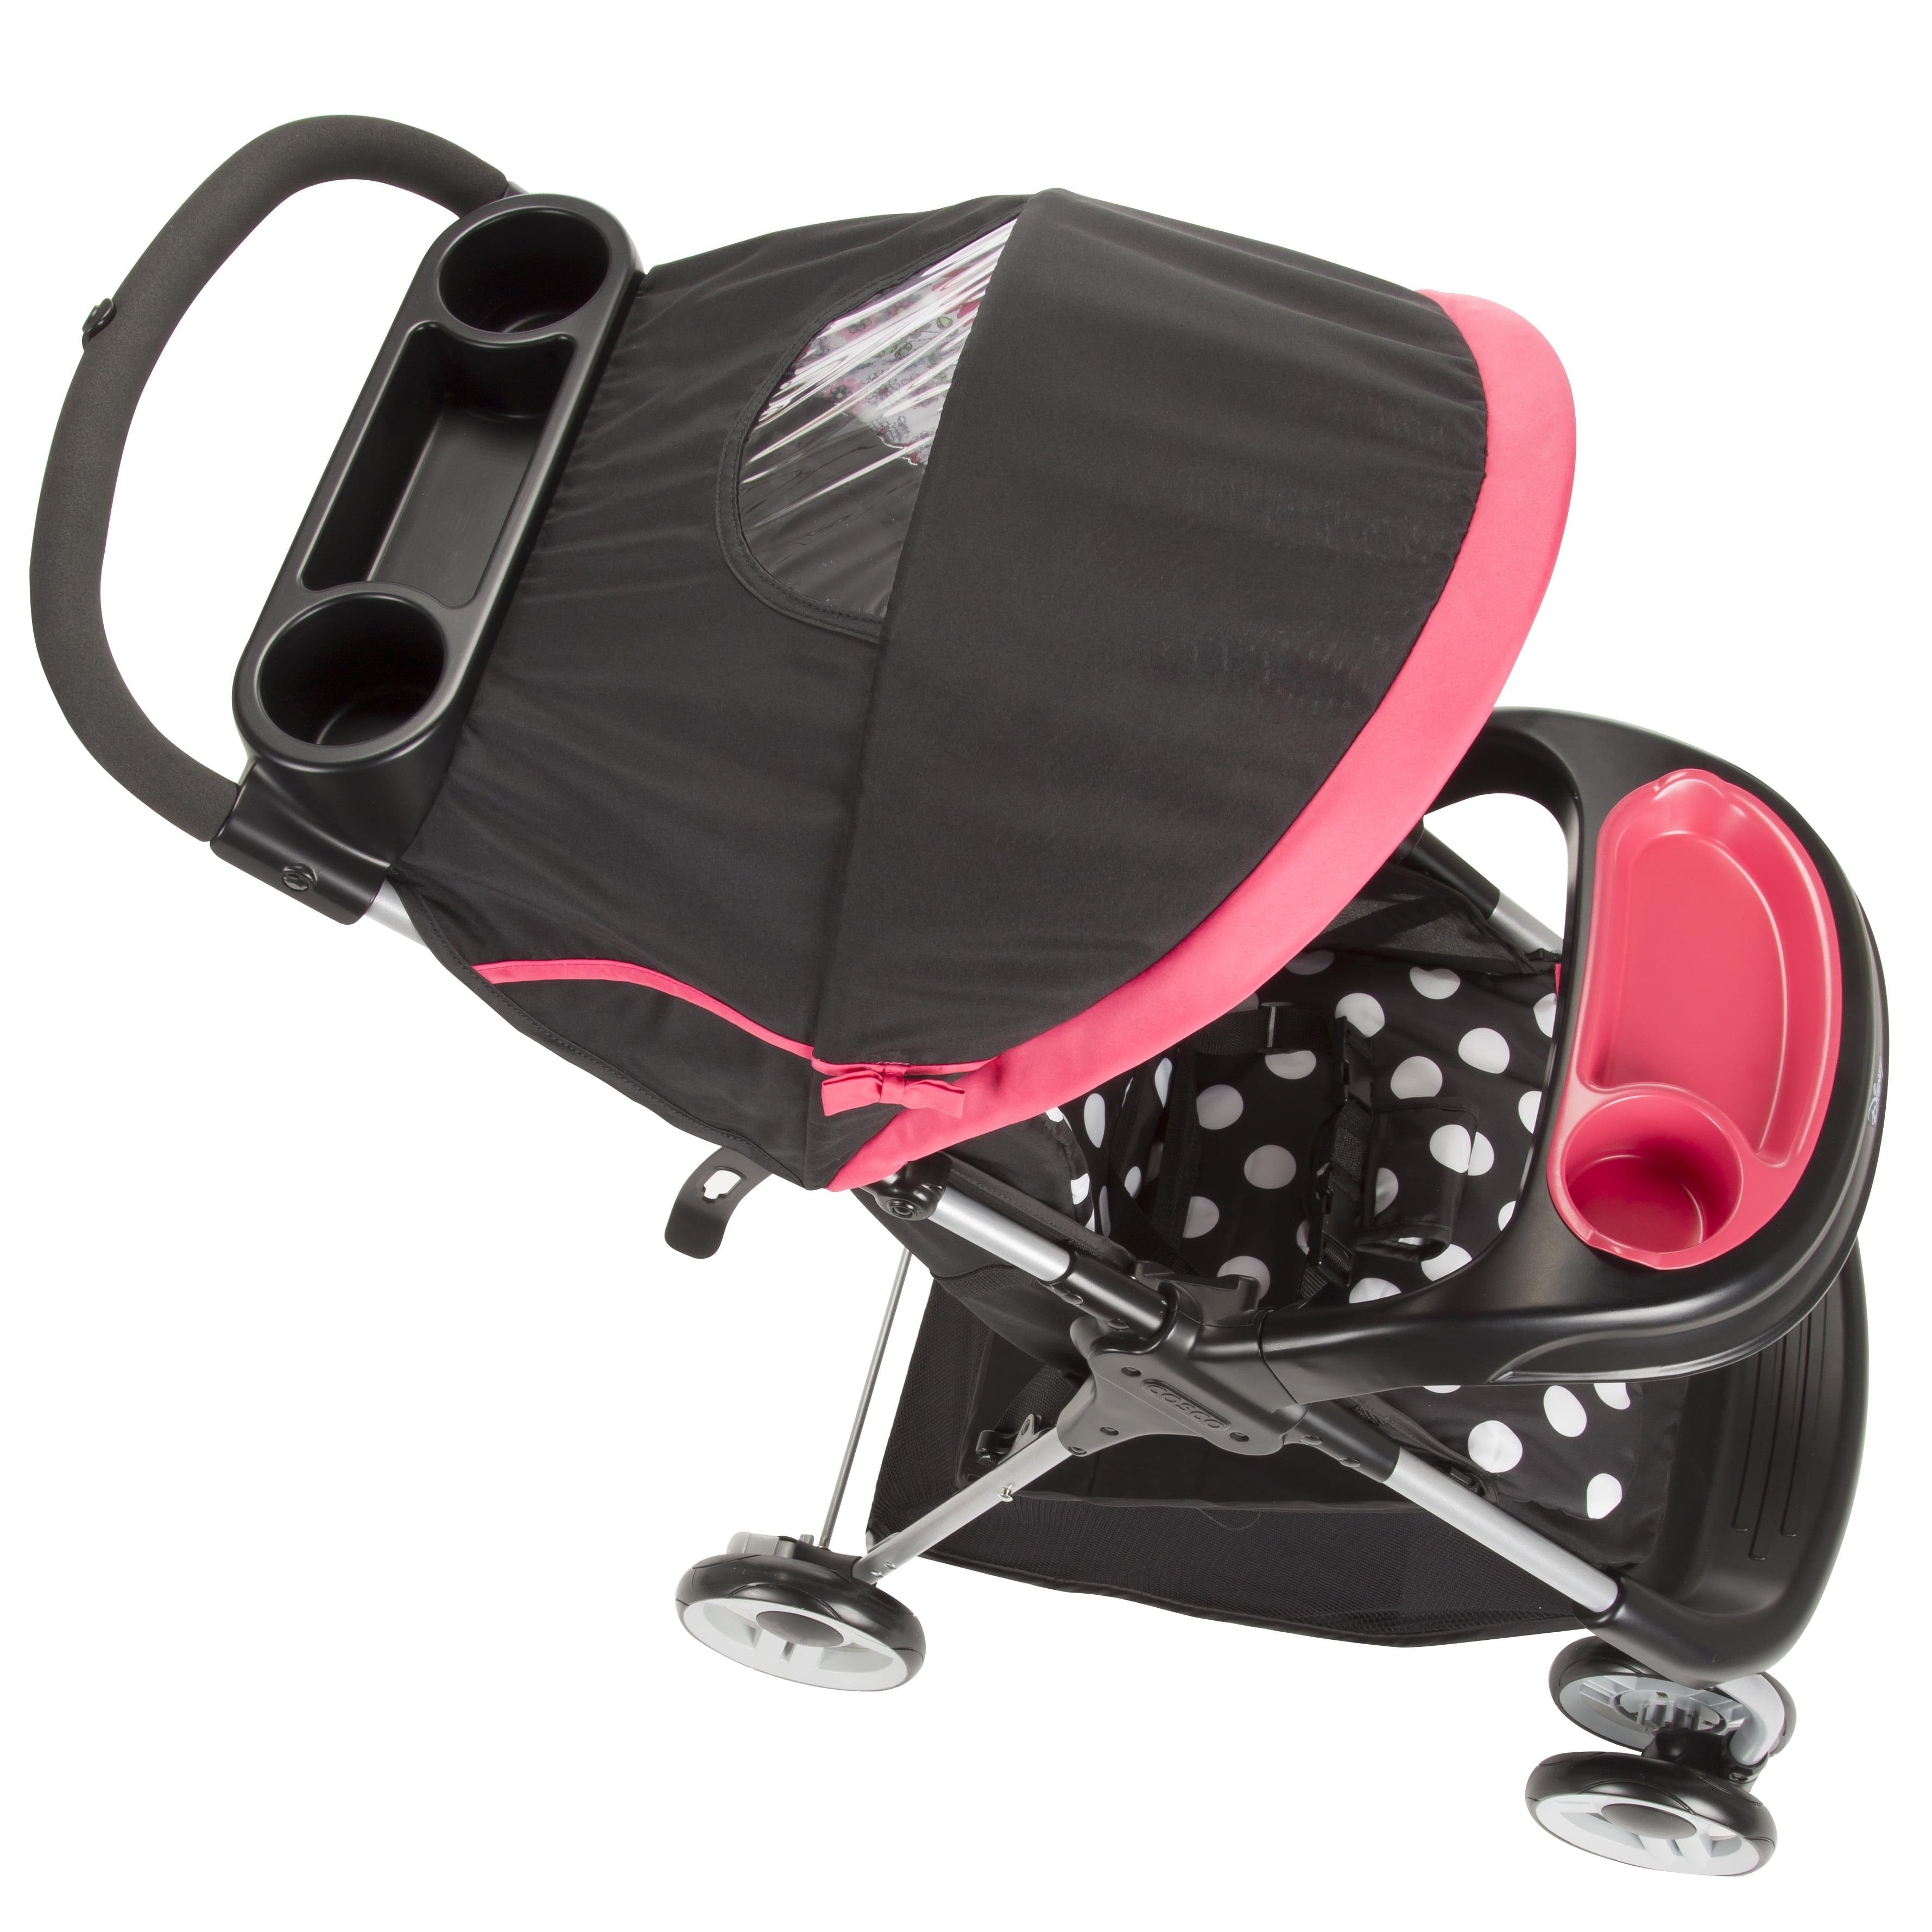 Travel System for Girls Lightweight Infant Car Seat Set Newborn Stroller Combo